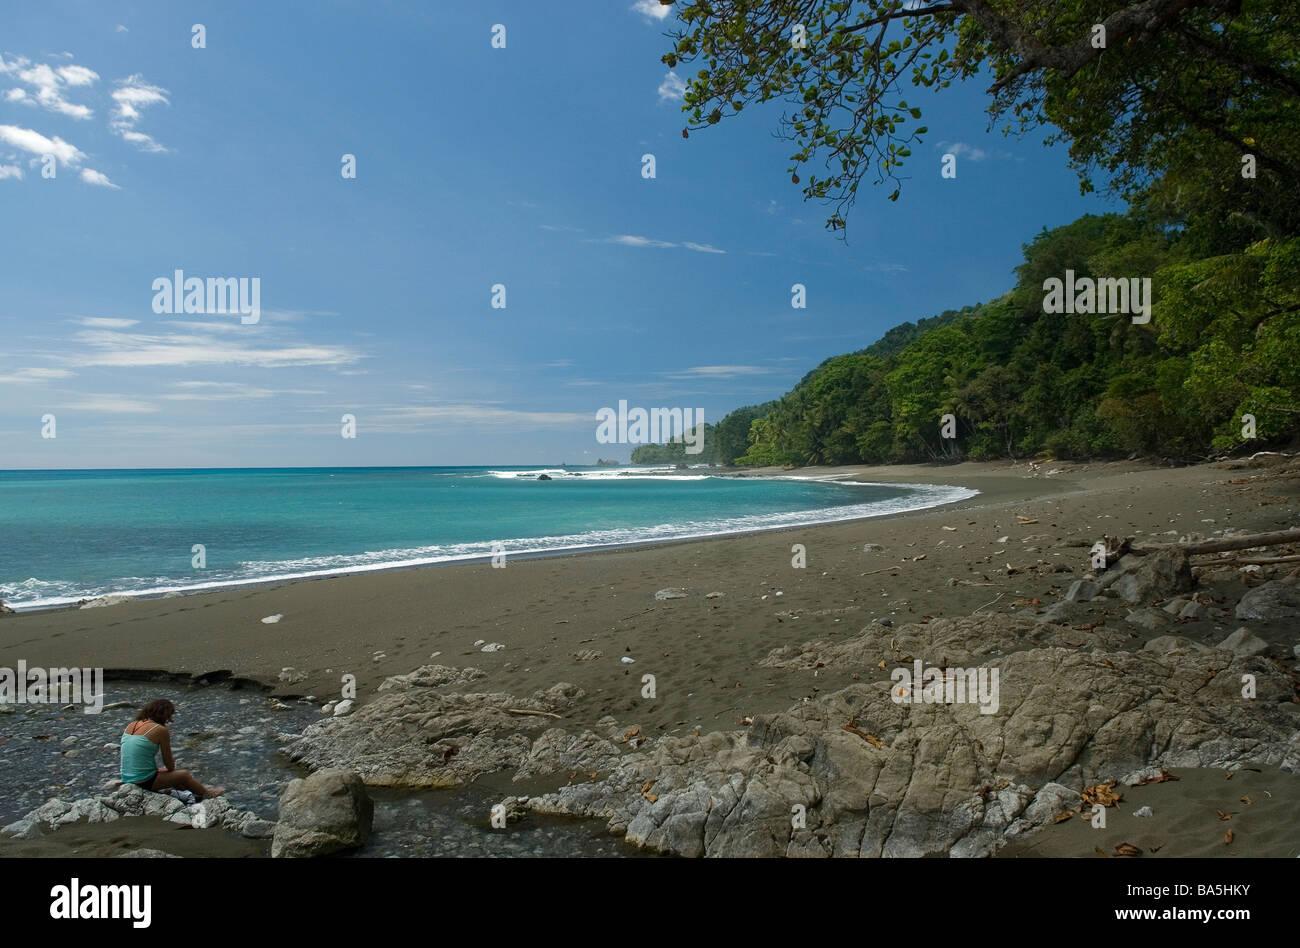 A pristine beach at Corcovado National Park - Stock Image